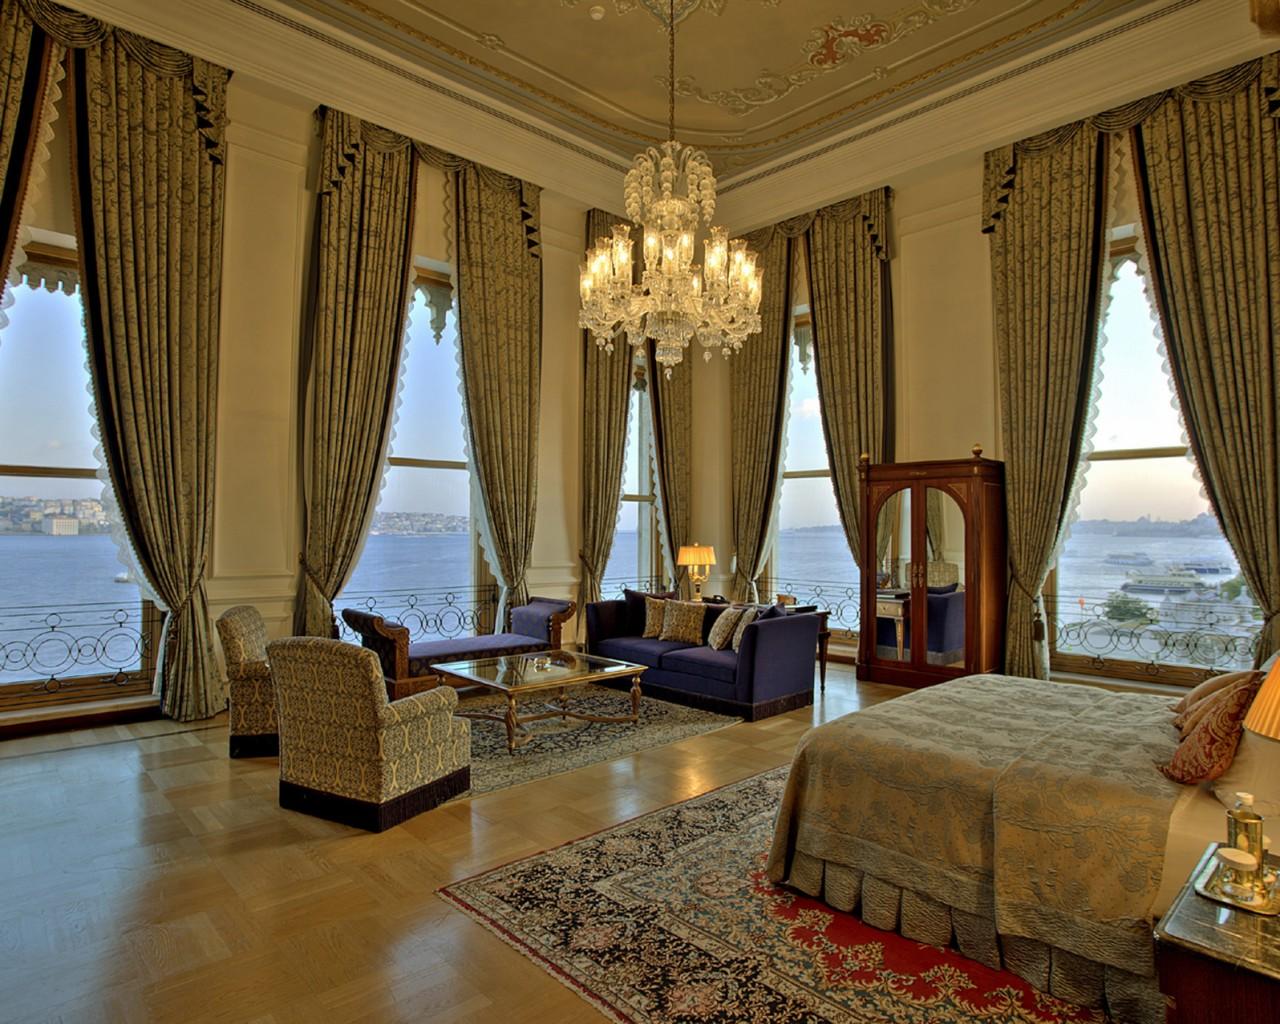 Romantic Çırağan Palace Kempinski Hotel Istanbul